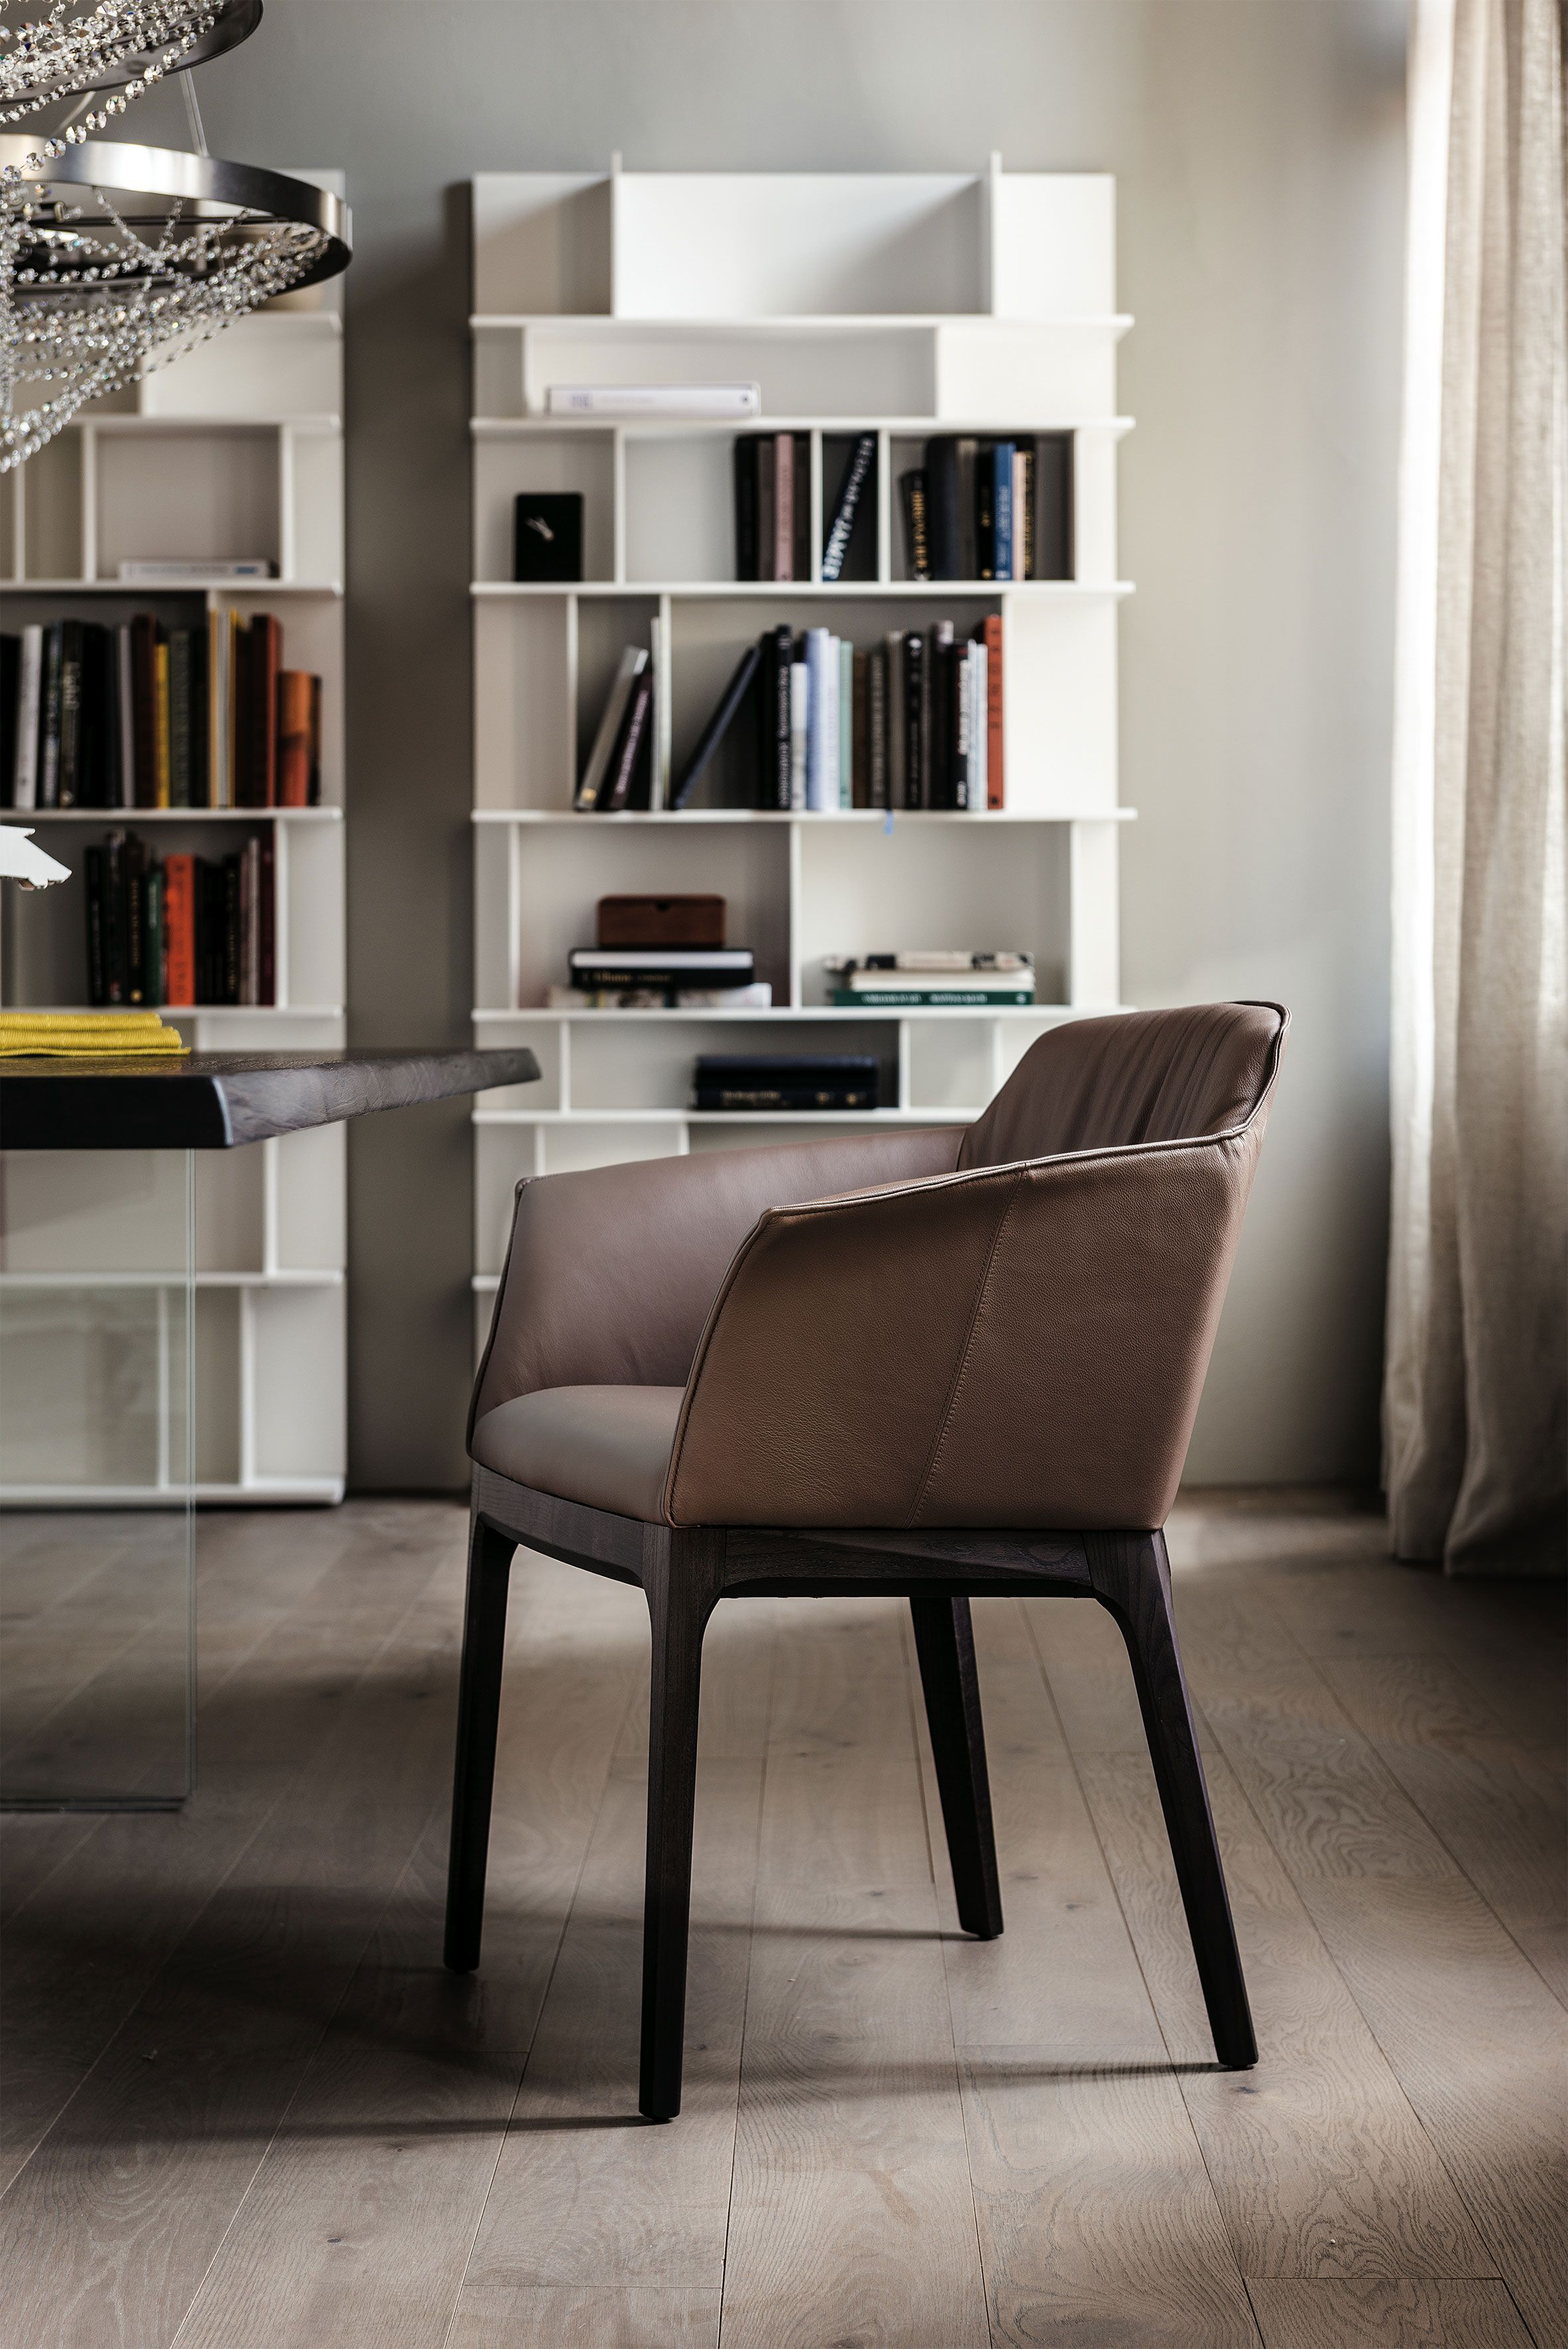 Stuhl Maroa In 2020 Stilvoll Wohnen Sitzecke Stuhle